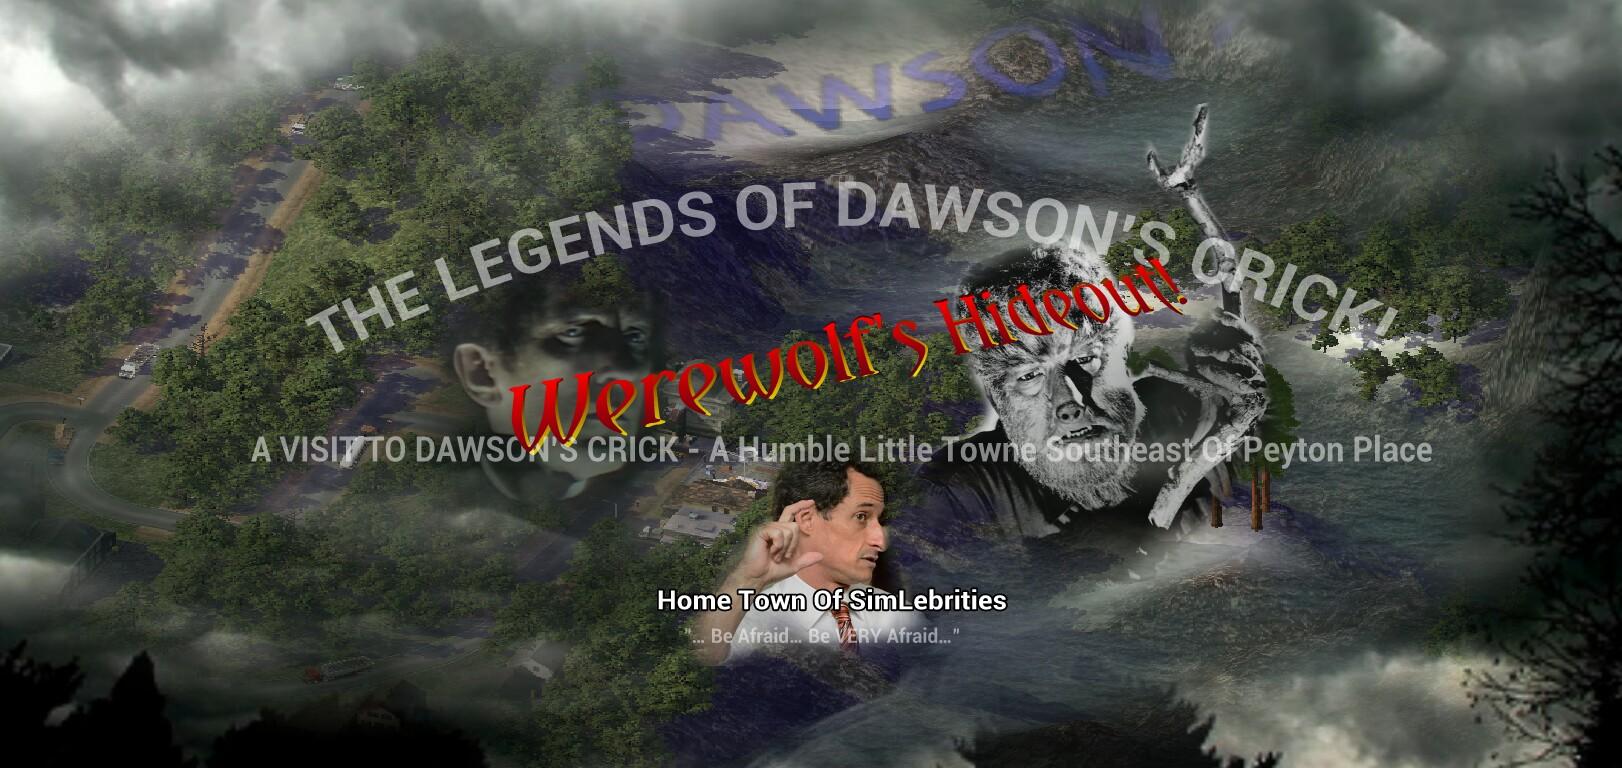 DAWSONS%20CRICK%20LANDING%20PAGE.JPG?psid=1